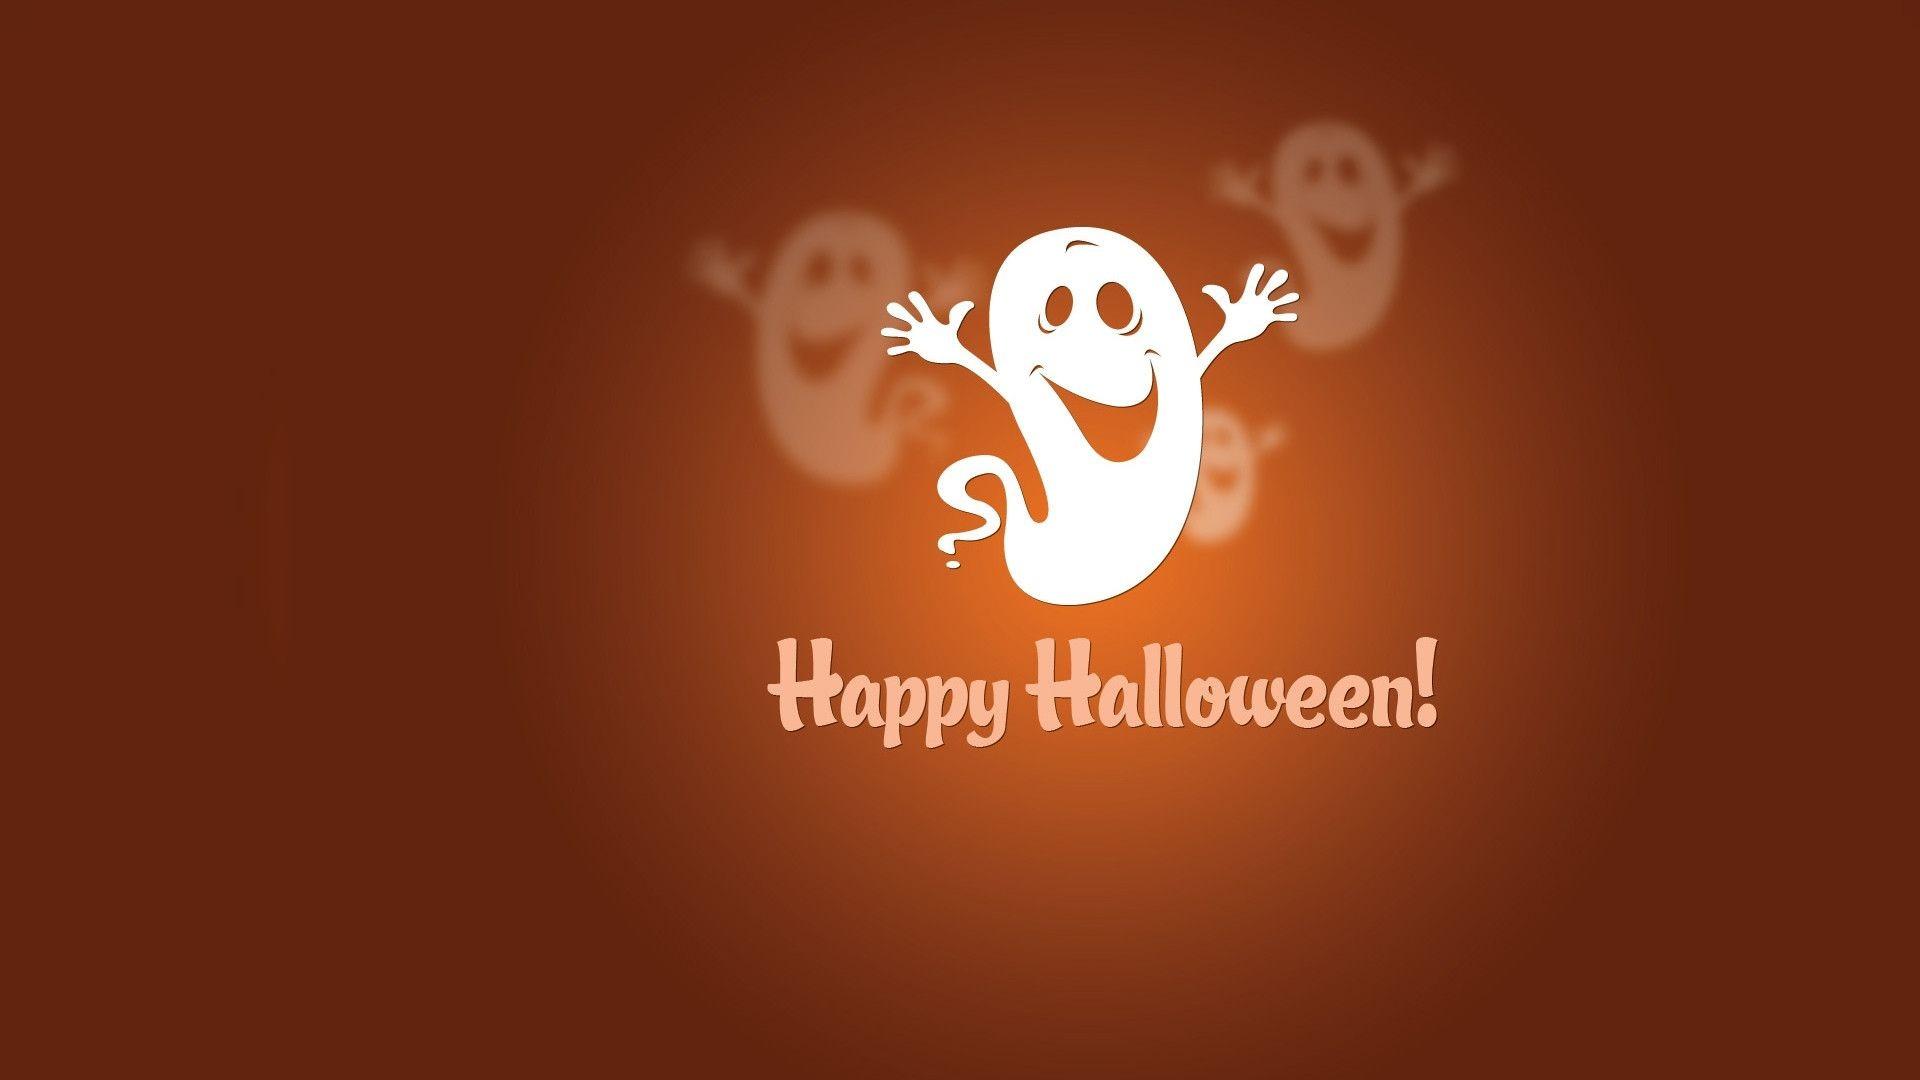 cute halloween wallpaper 183�� download free beautiful hd